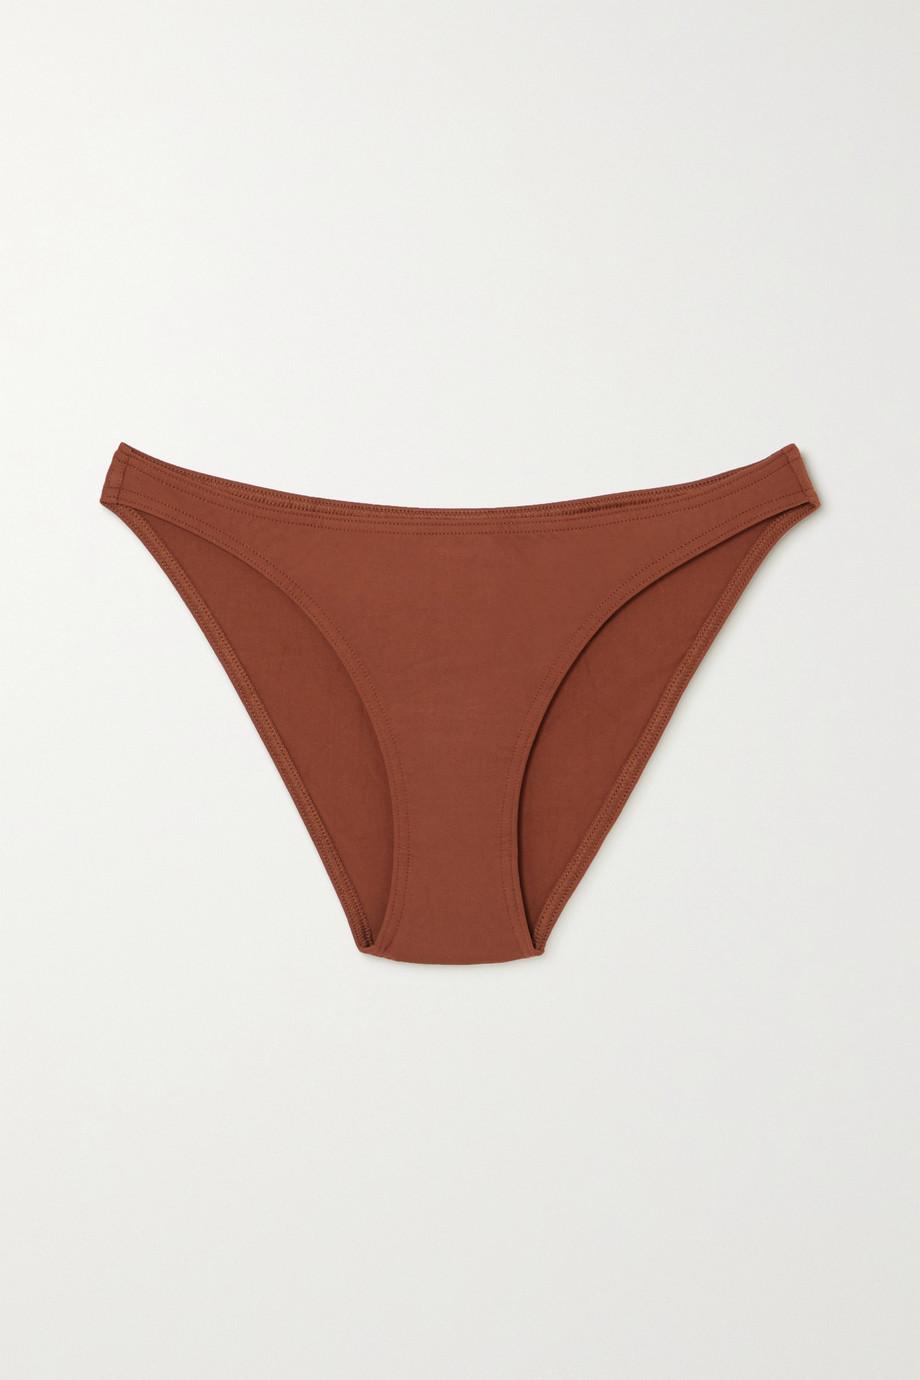 Eres Les Essentiels Scarlett bikini briefs